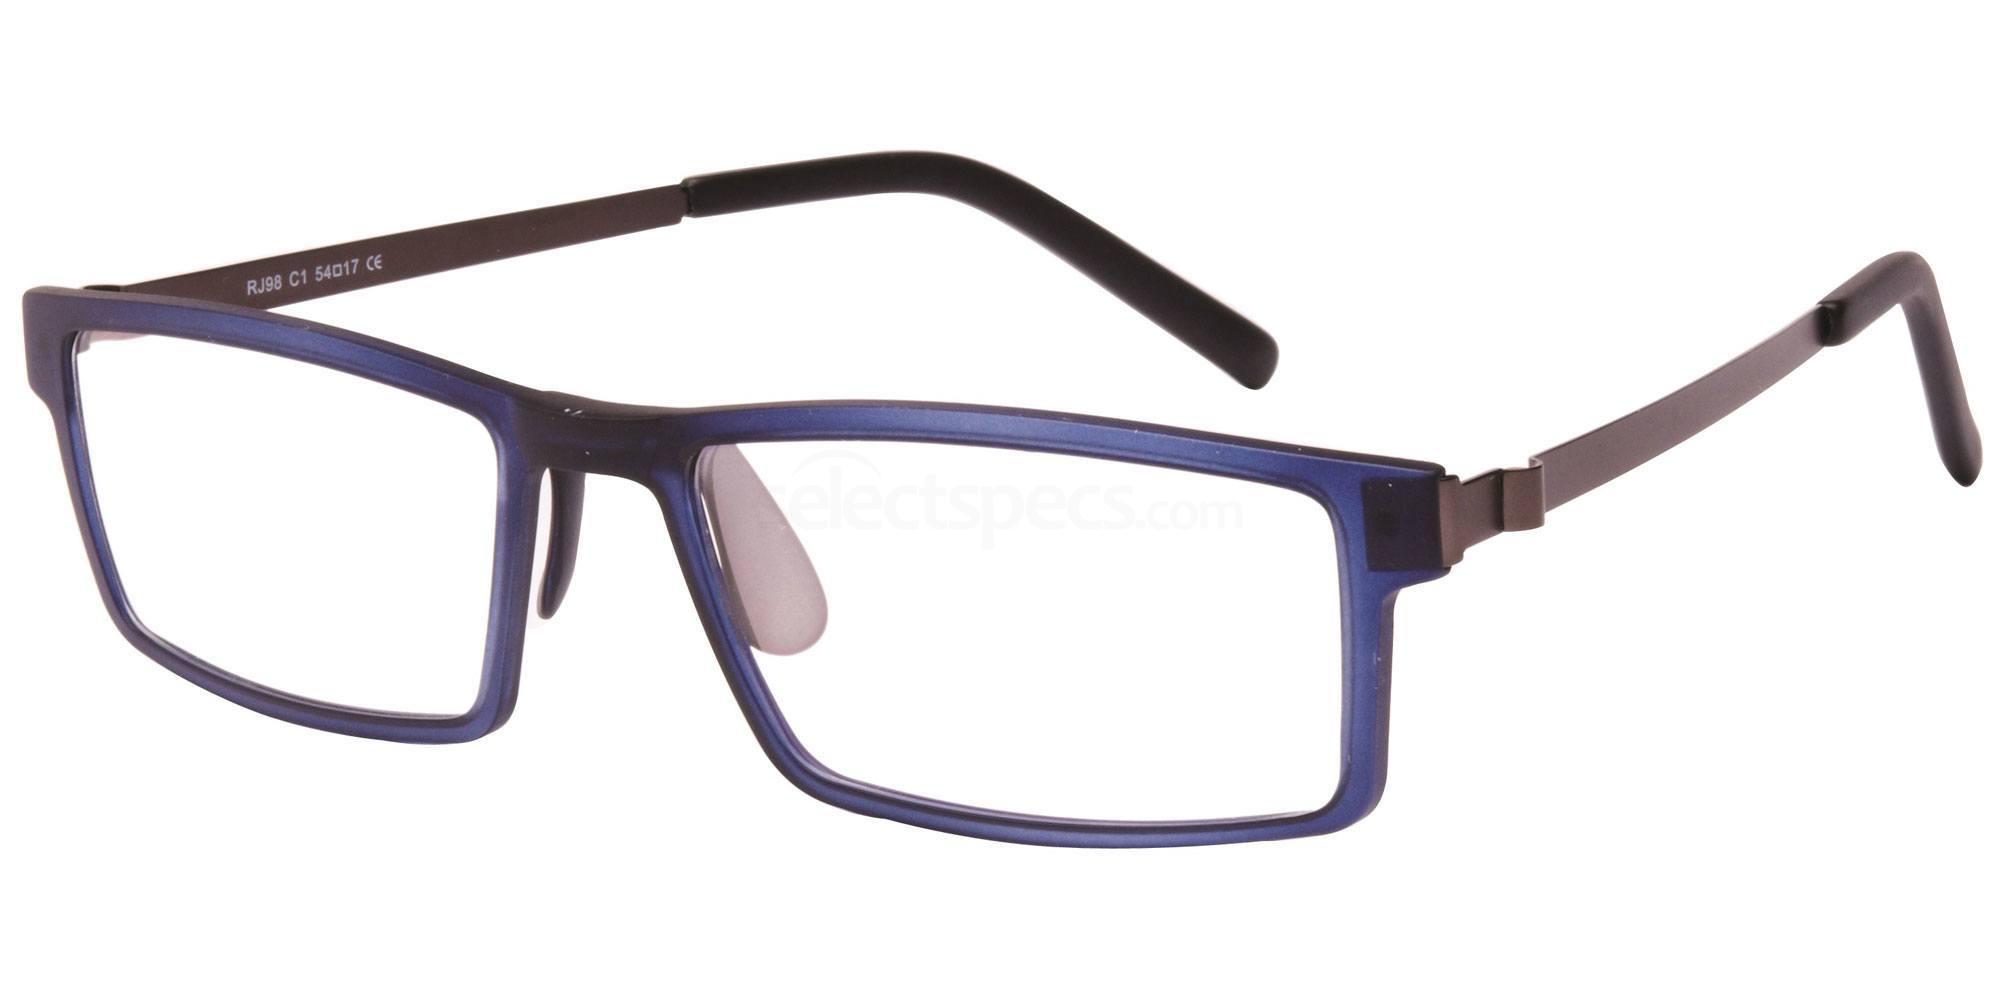 C1 RJ98 Glasses, Romeo & Juliet